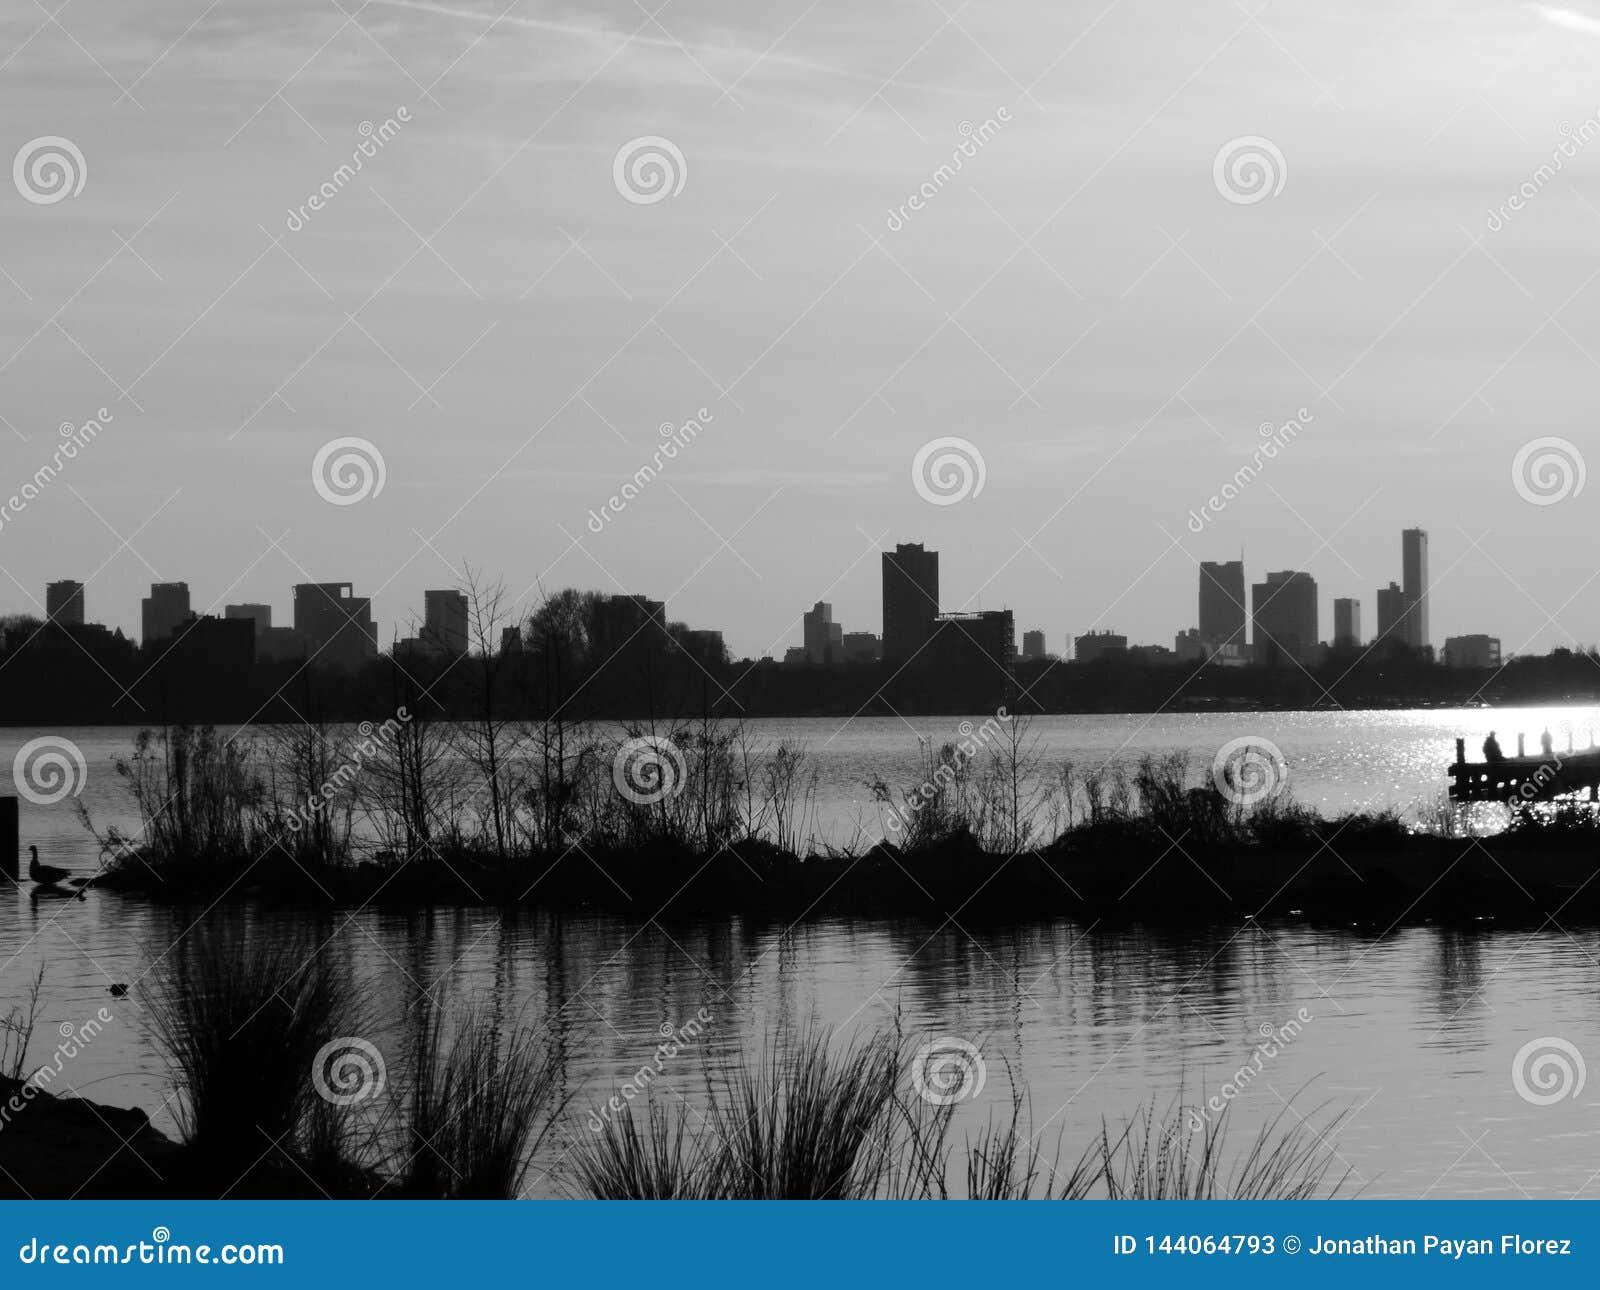 Rotterdam in black and white